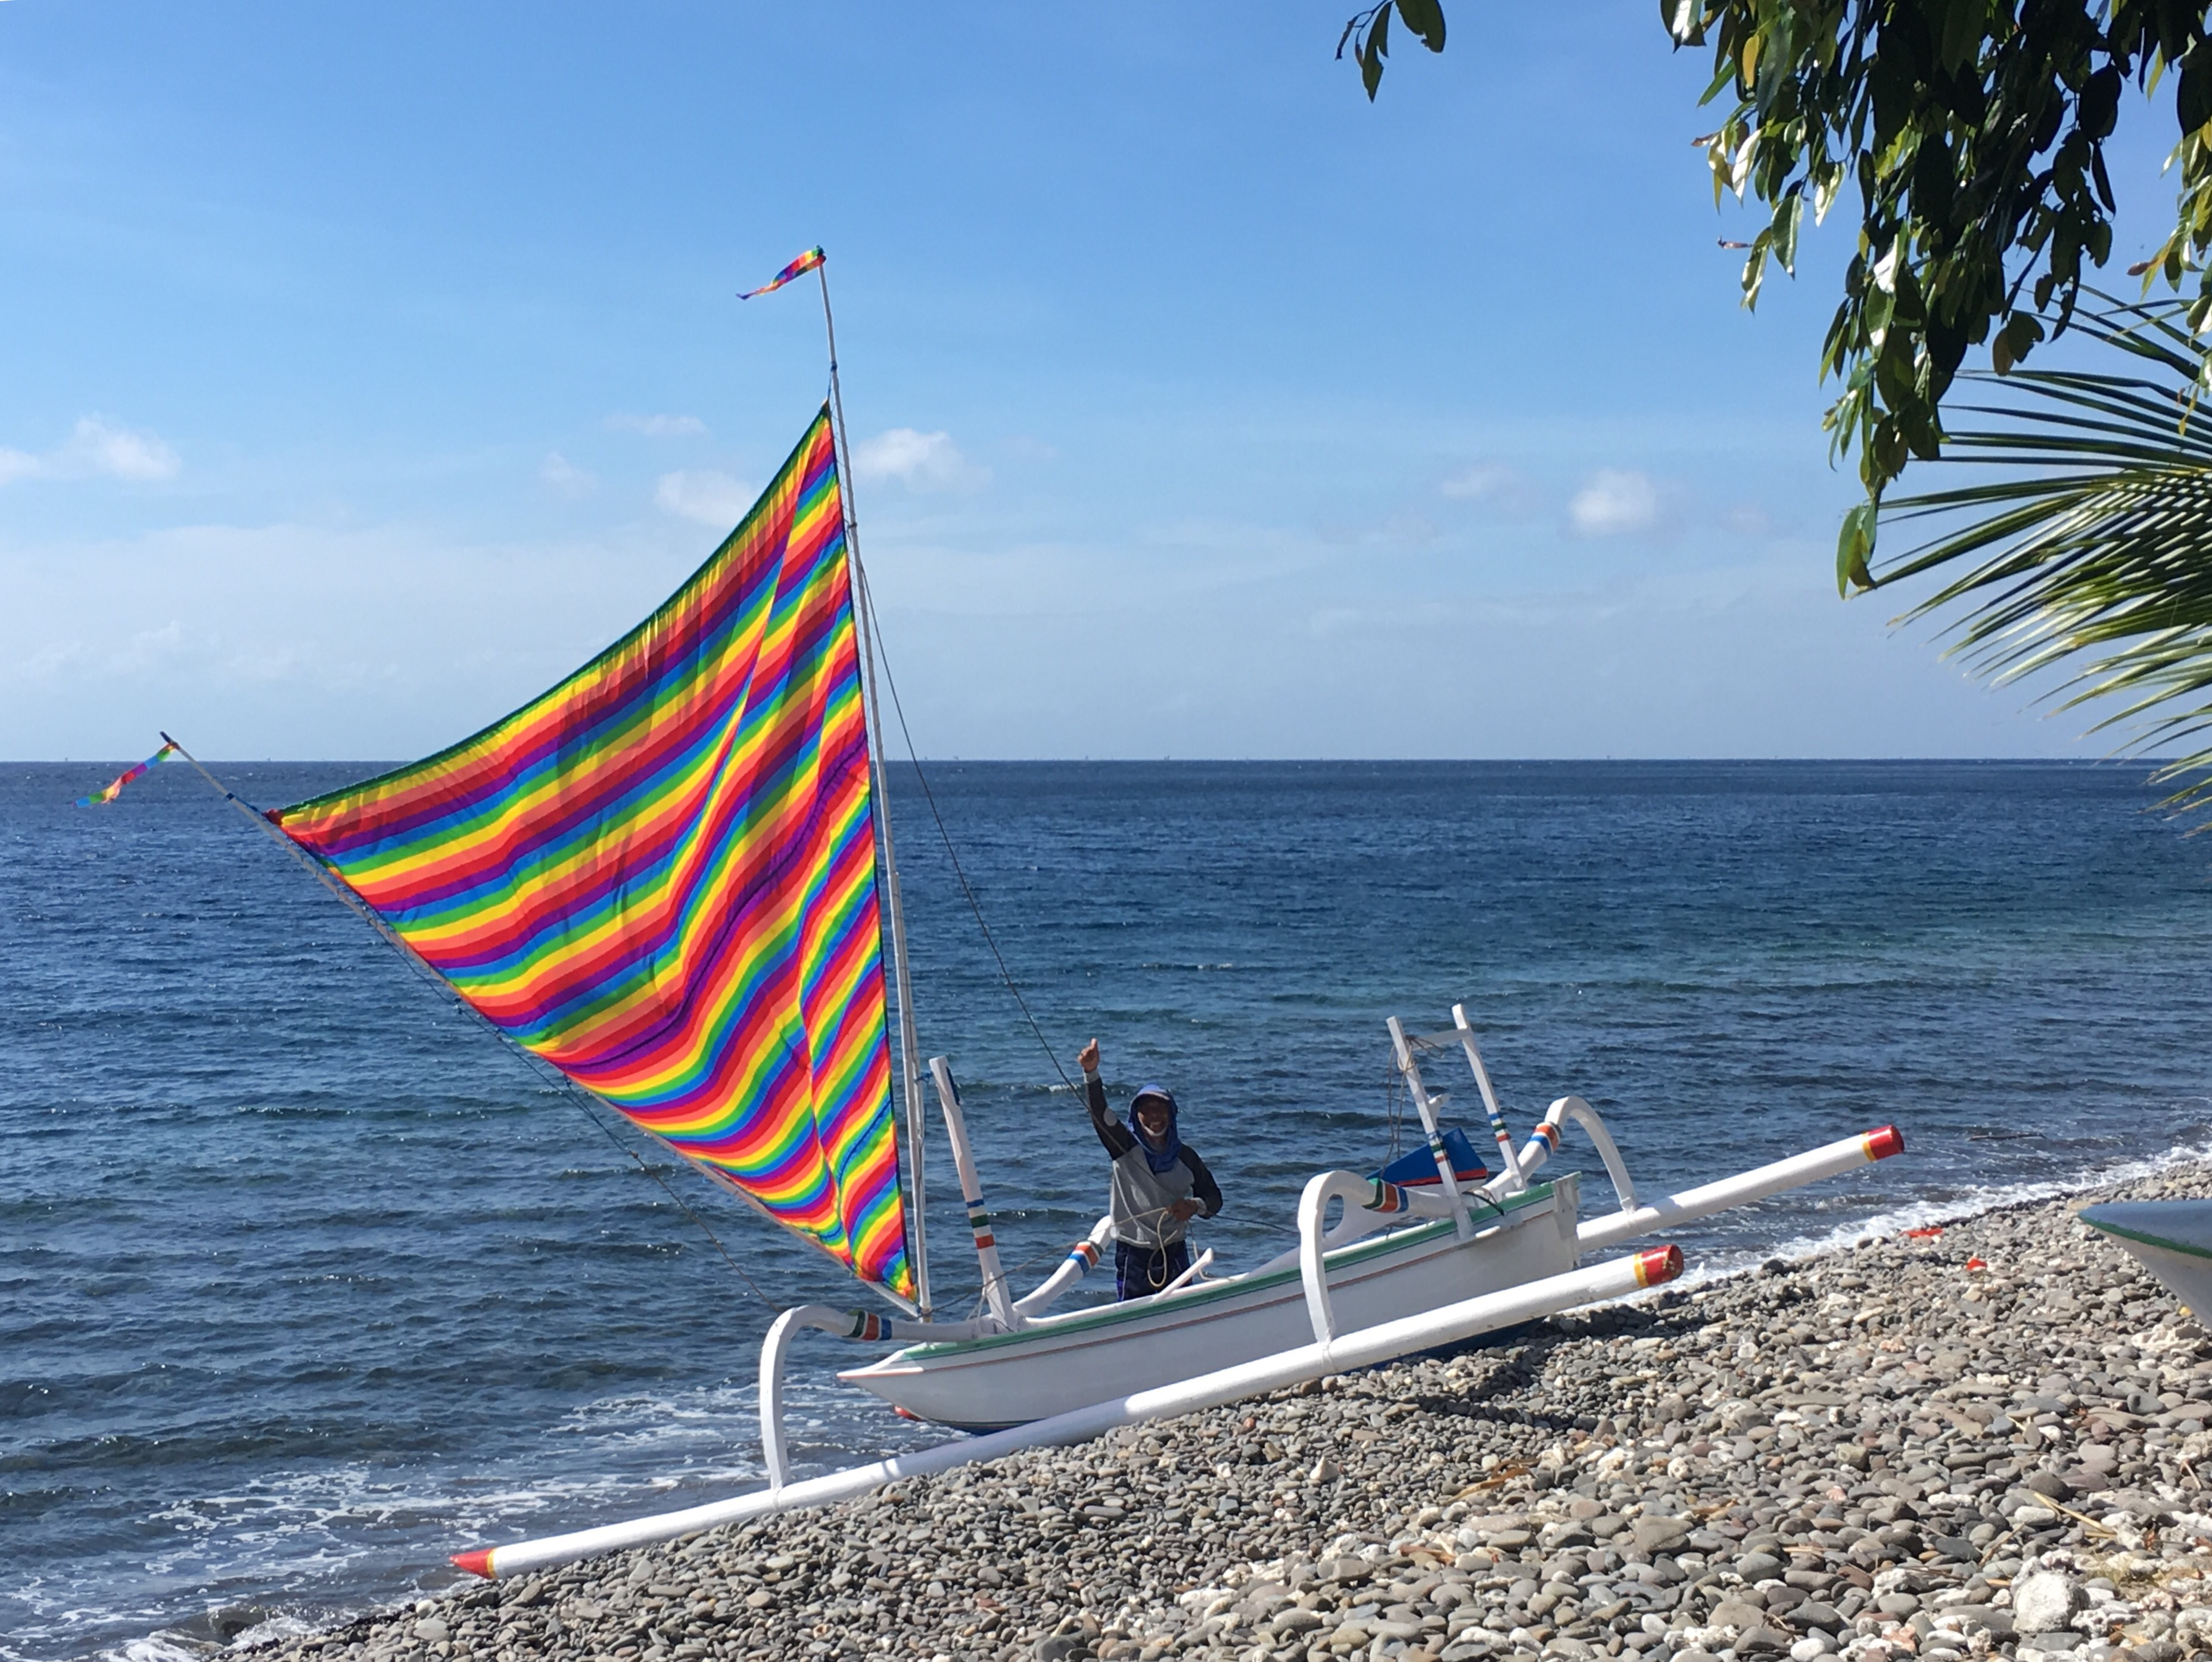 vissers amed bali